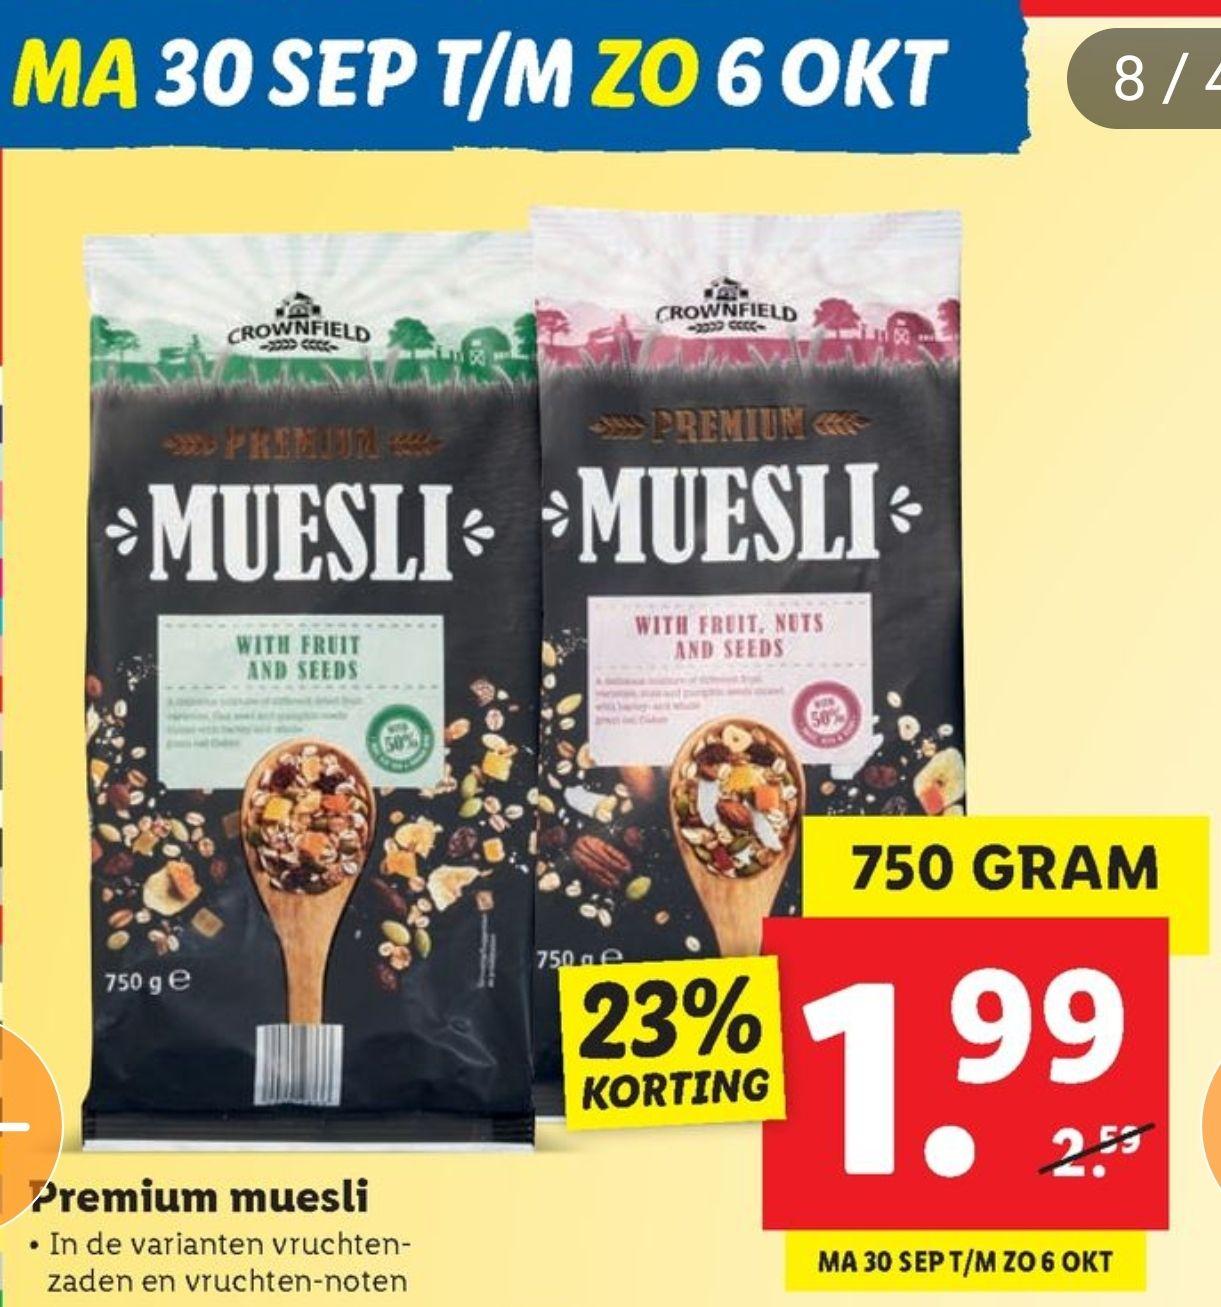 Premium Muesli 750gr extra korting @Lidl